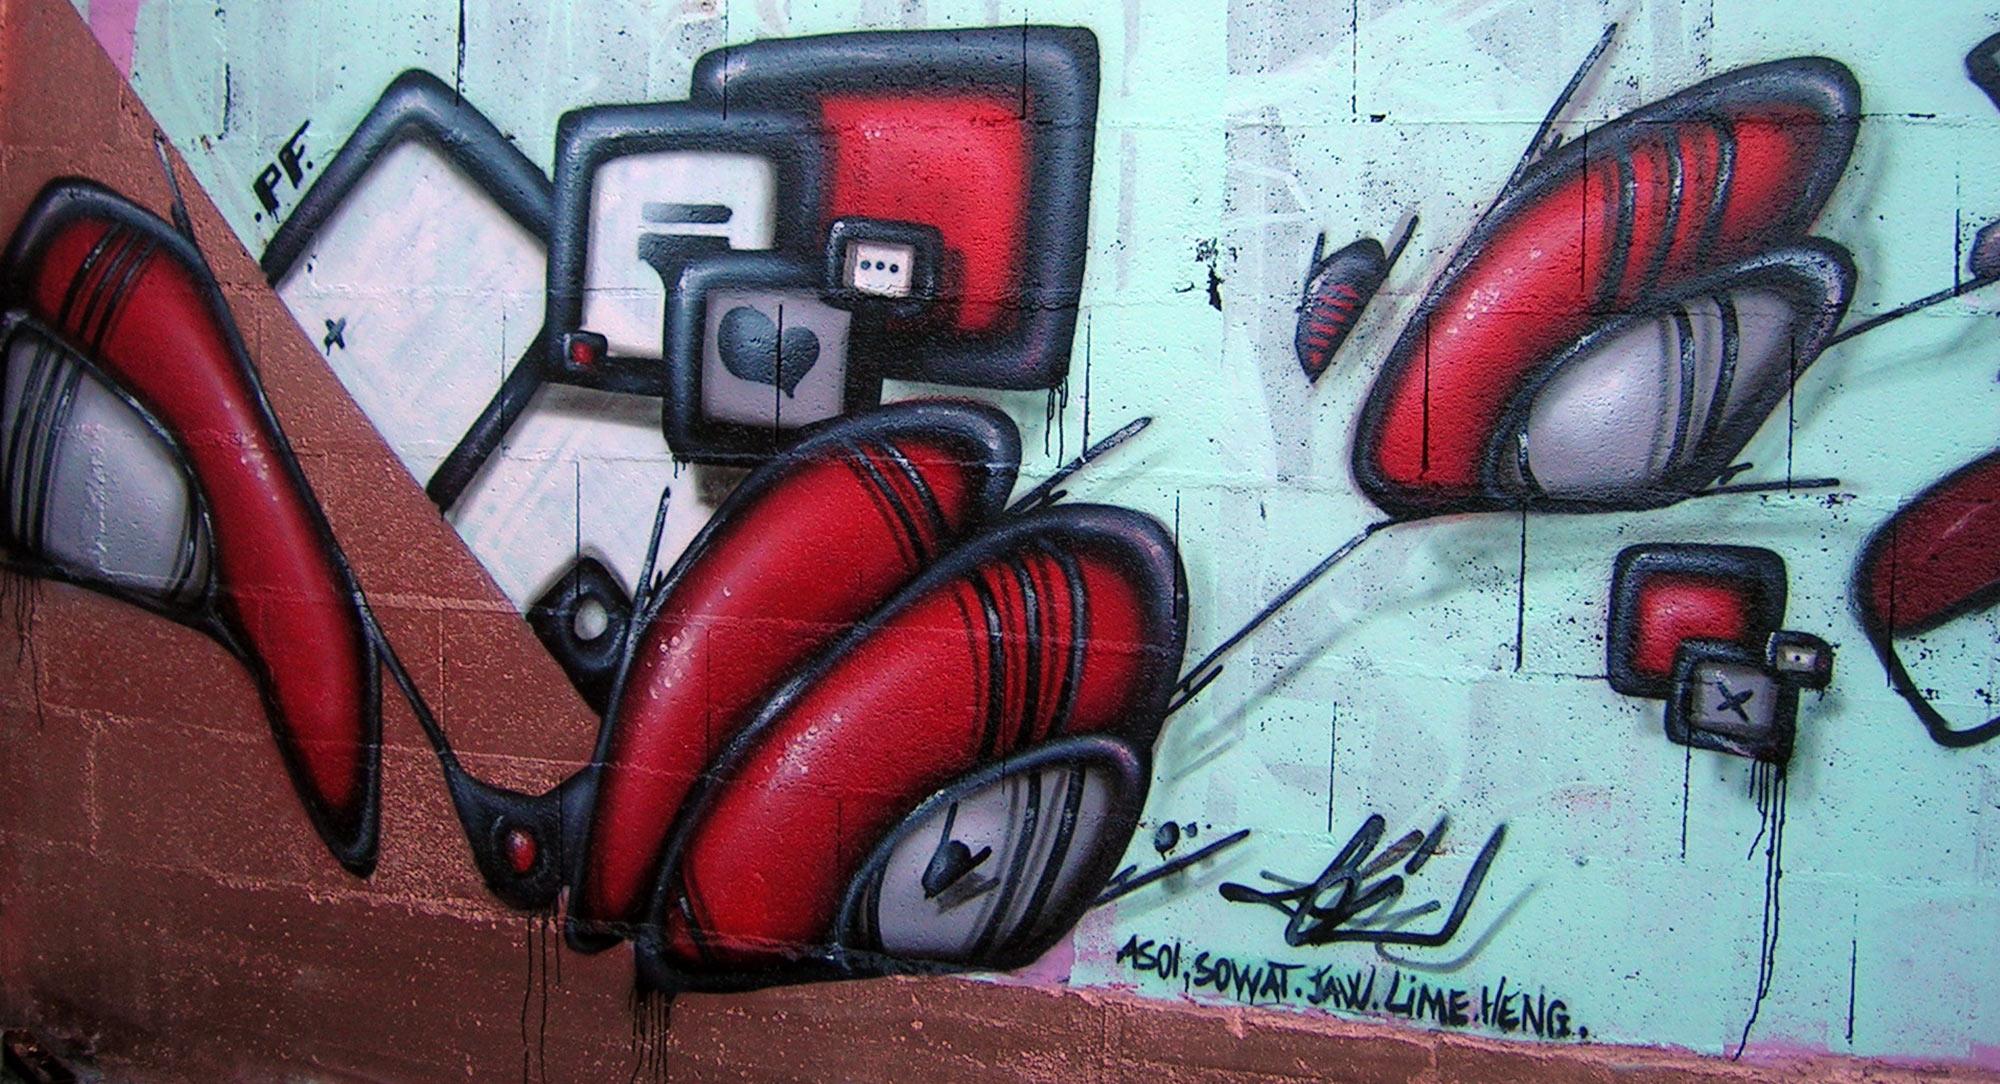 Slop - Graffiti - Brad Tout - Riom